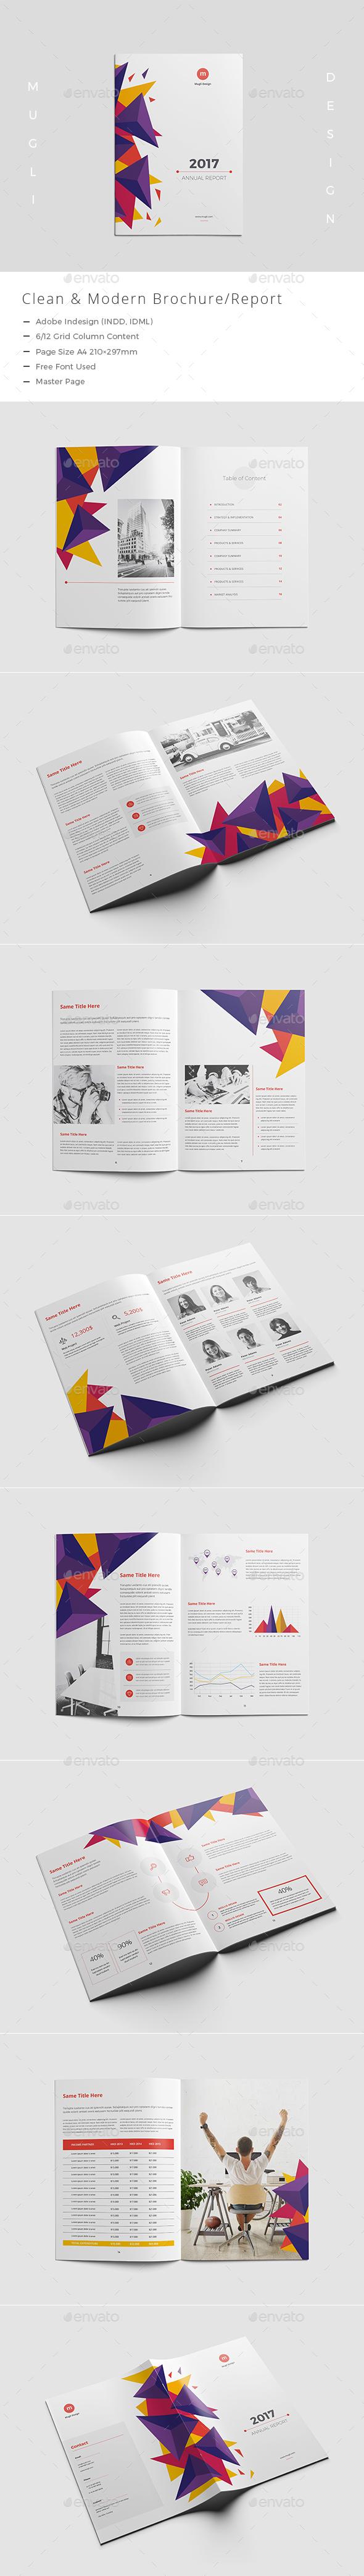 Clean & Modern Brochure/Report - Corporate Brochures